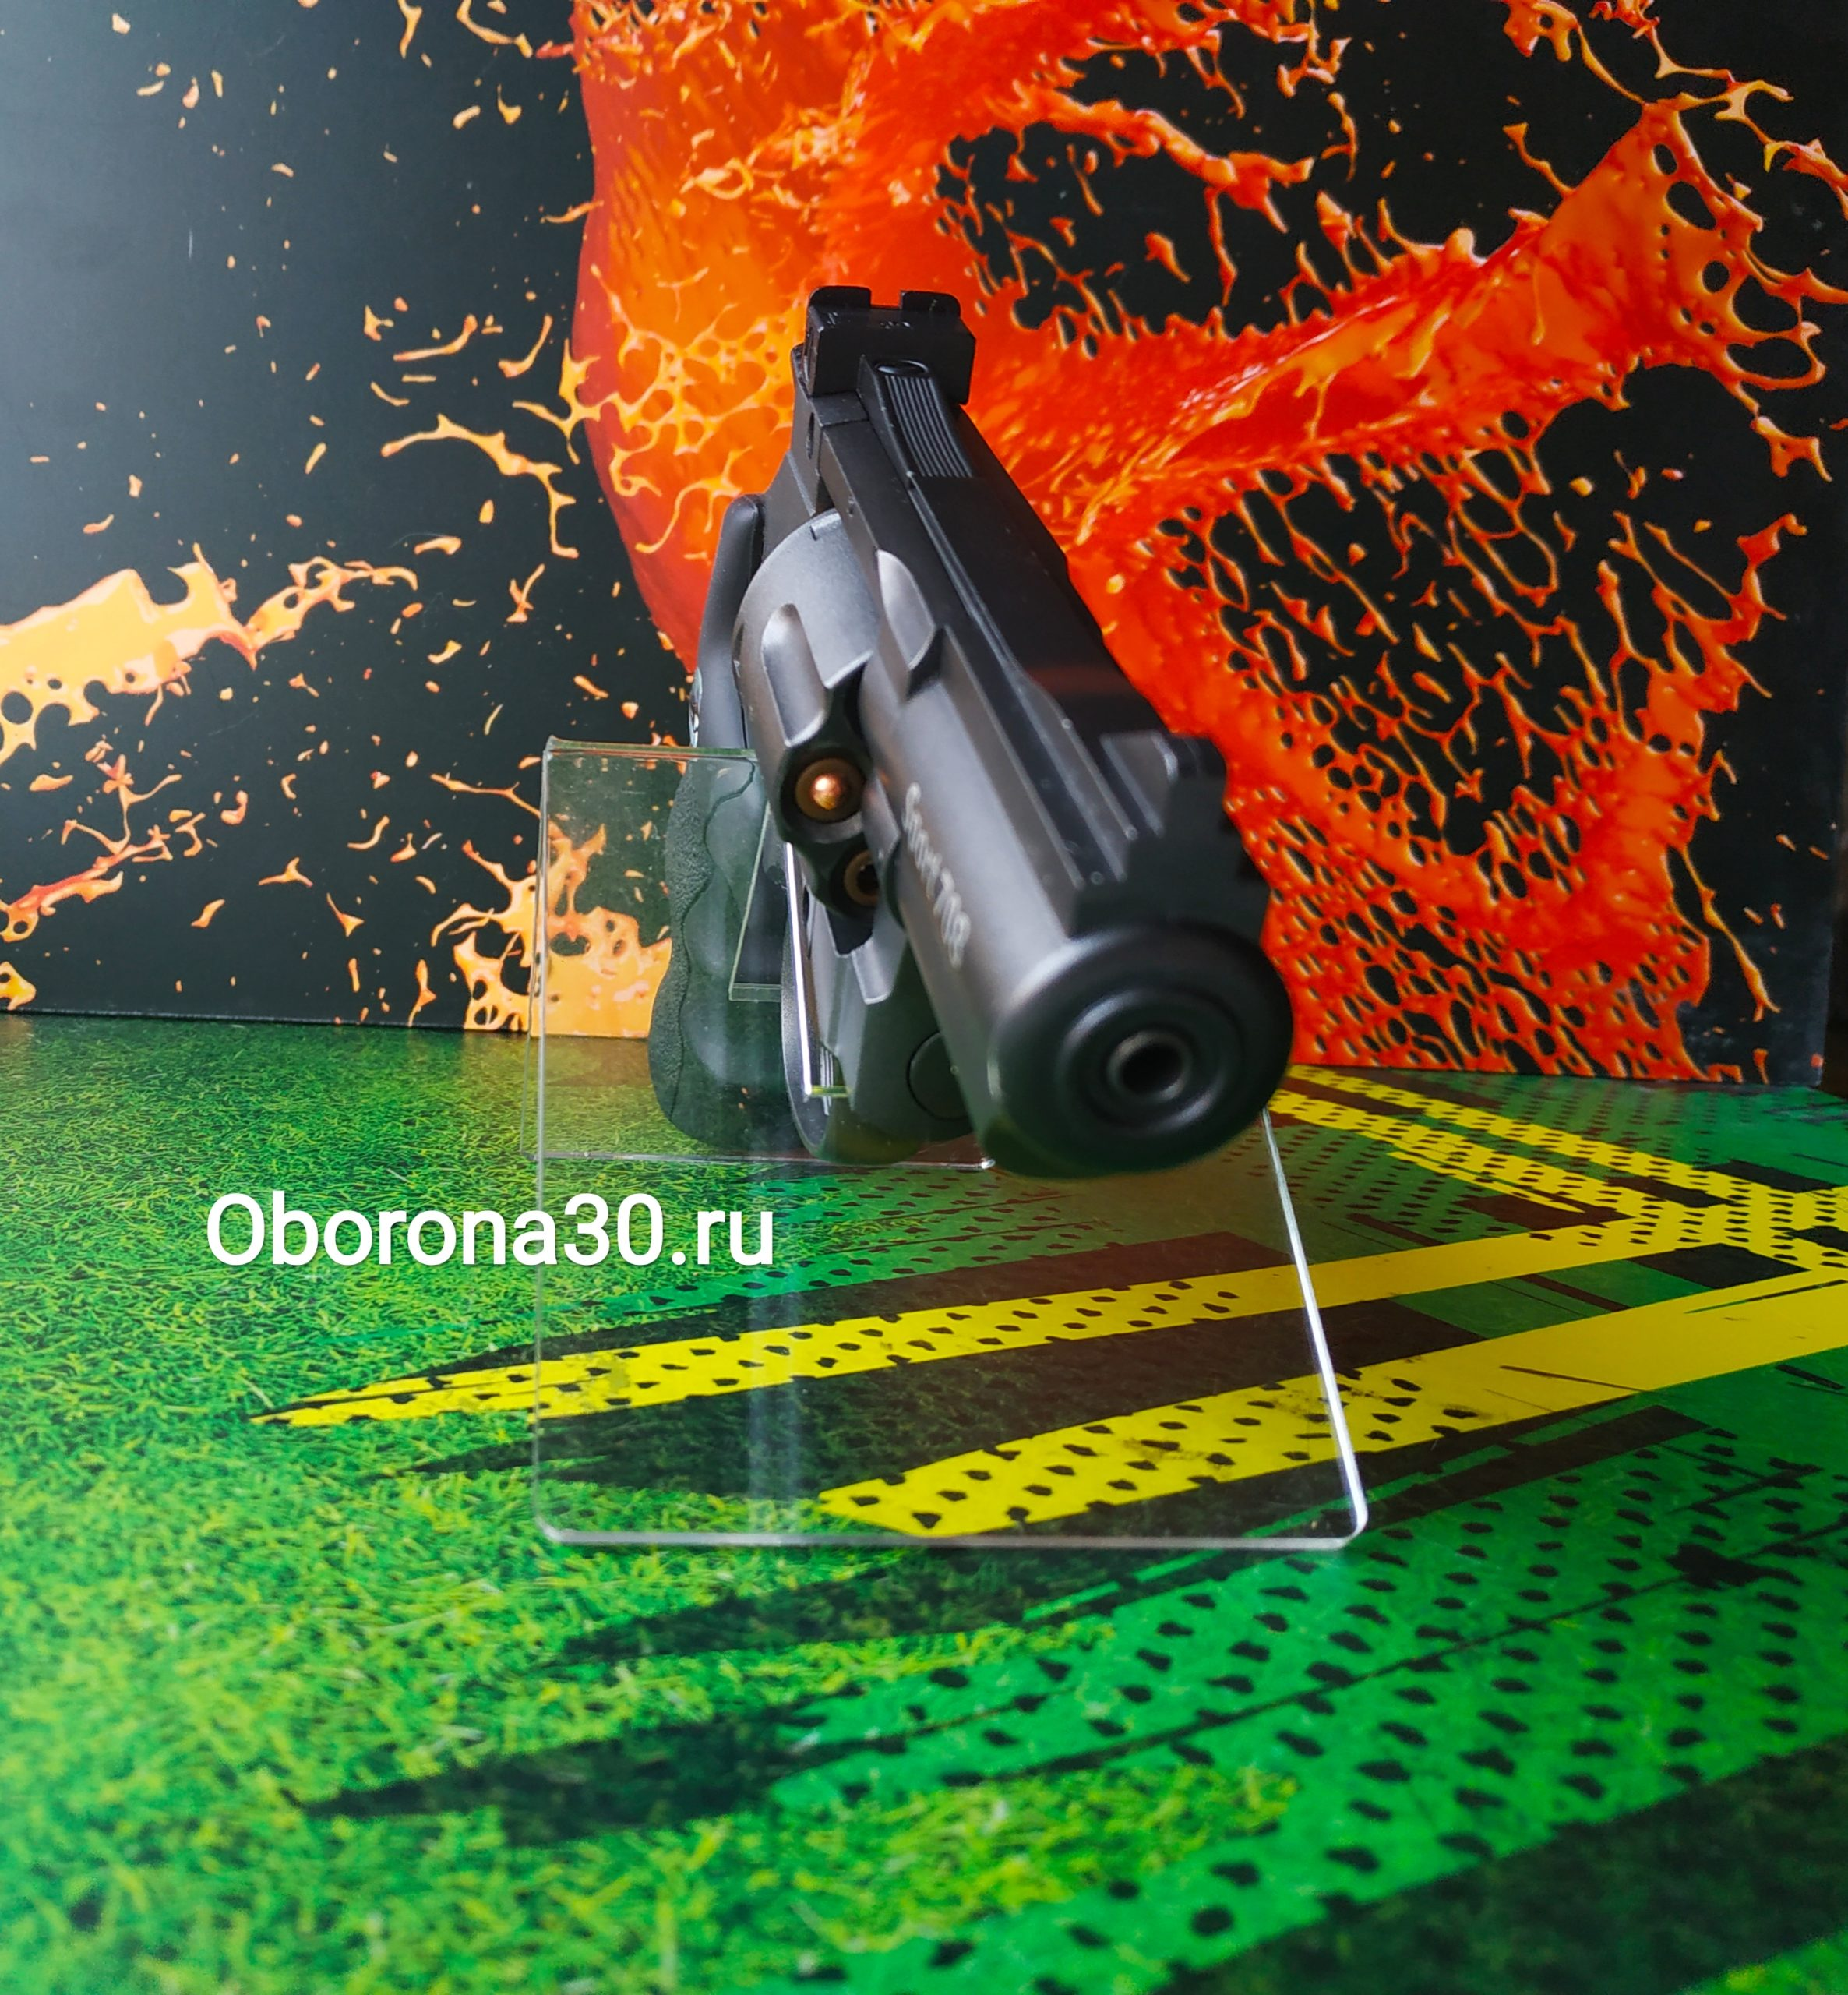 Пневматические Пистолеты Пневматический револьвер Smith&Wesson (Borner, Super Sport 708)